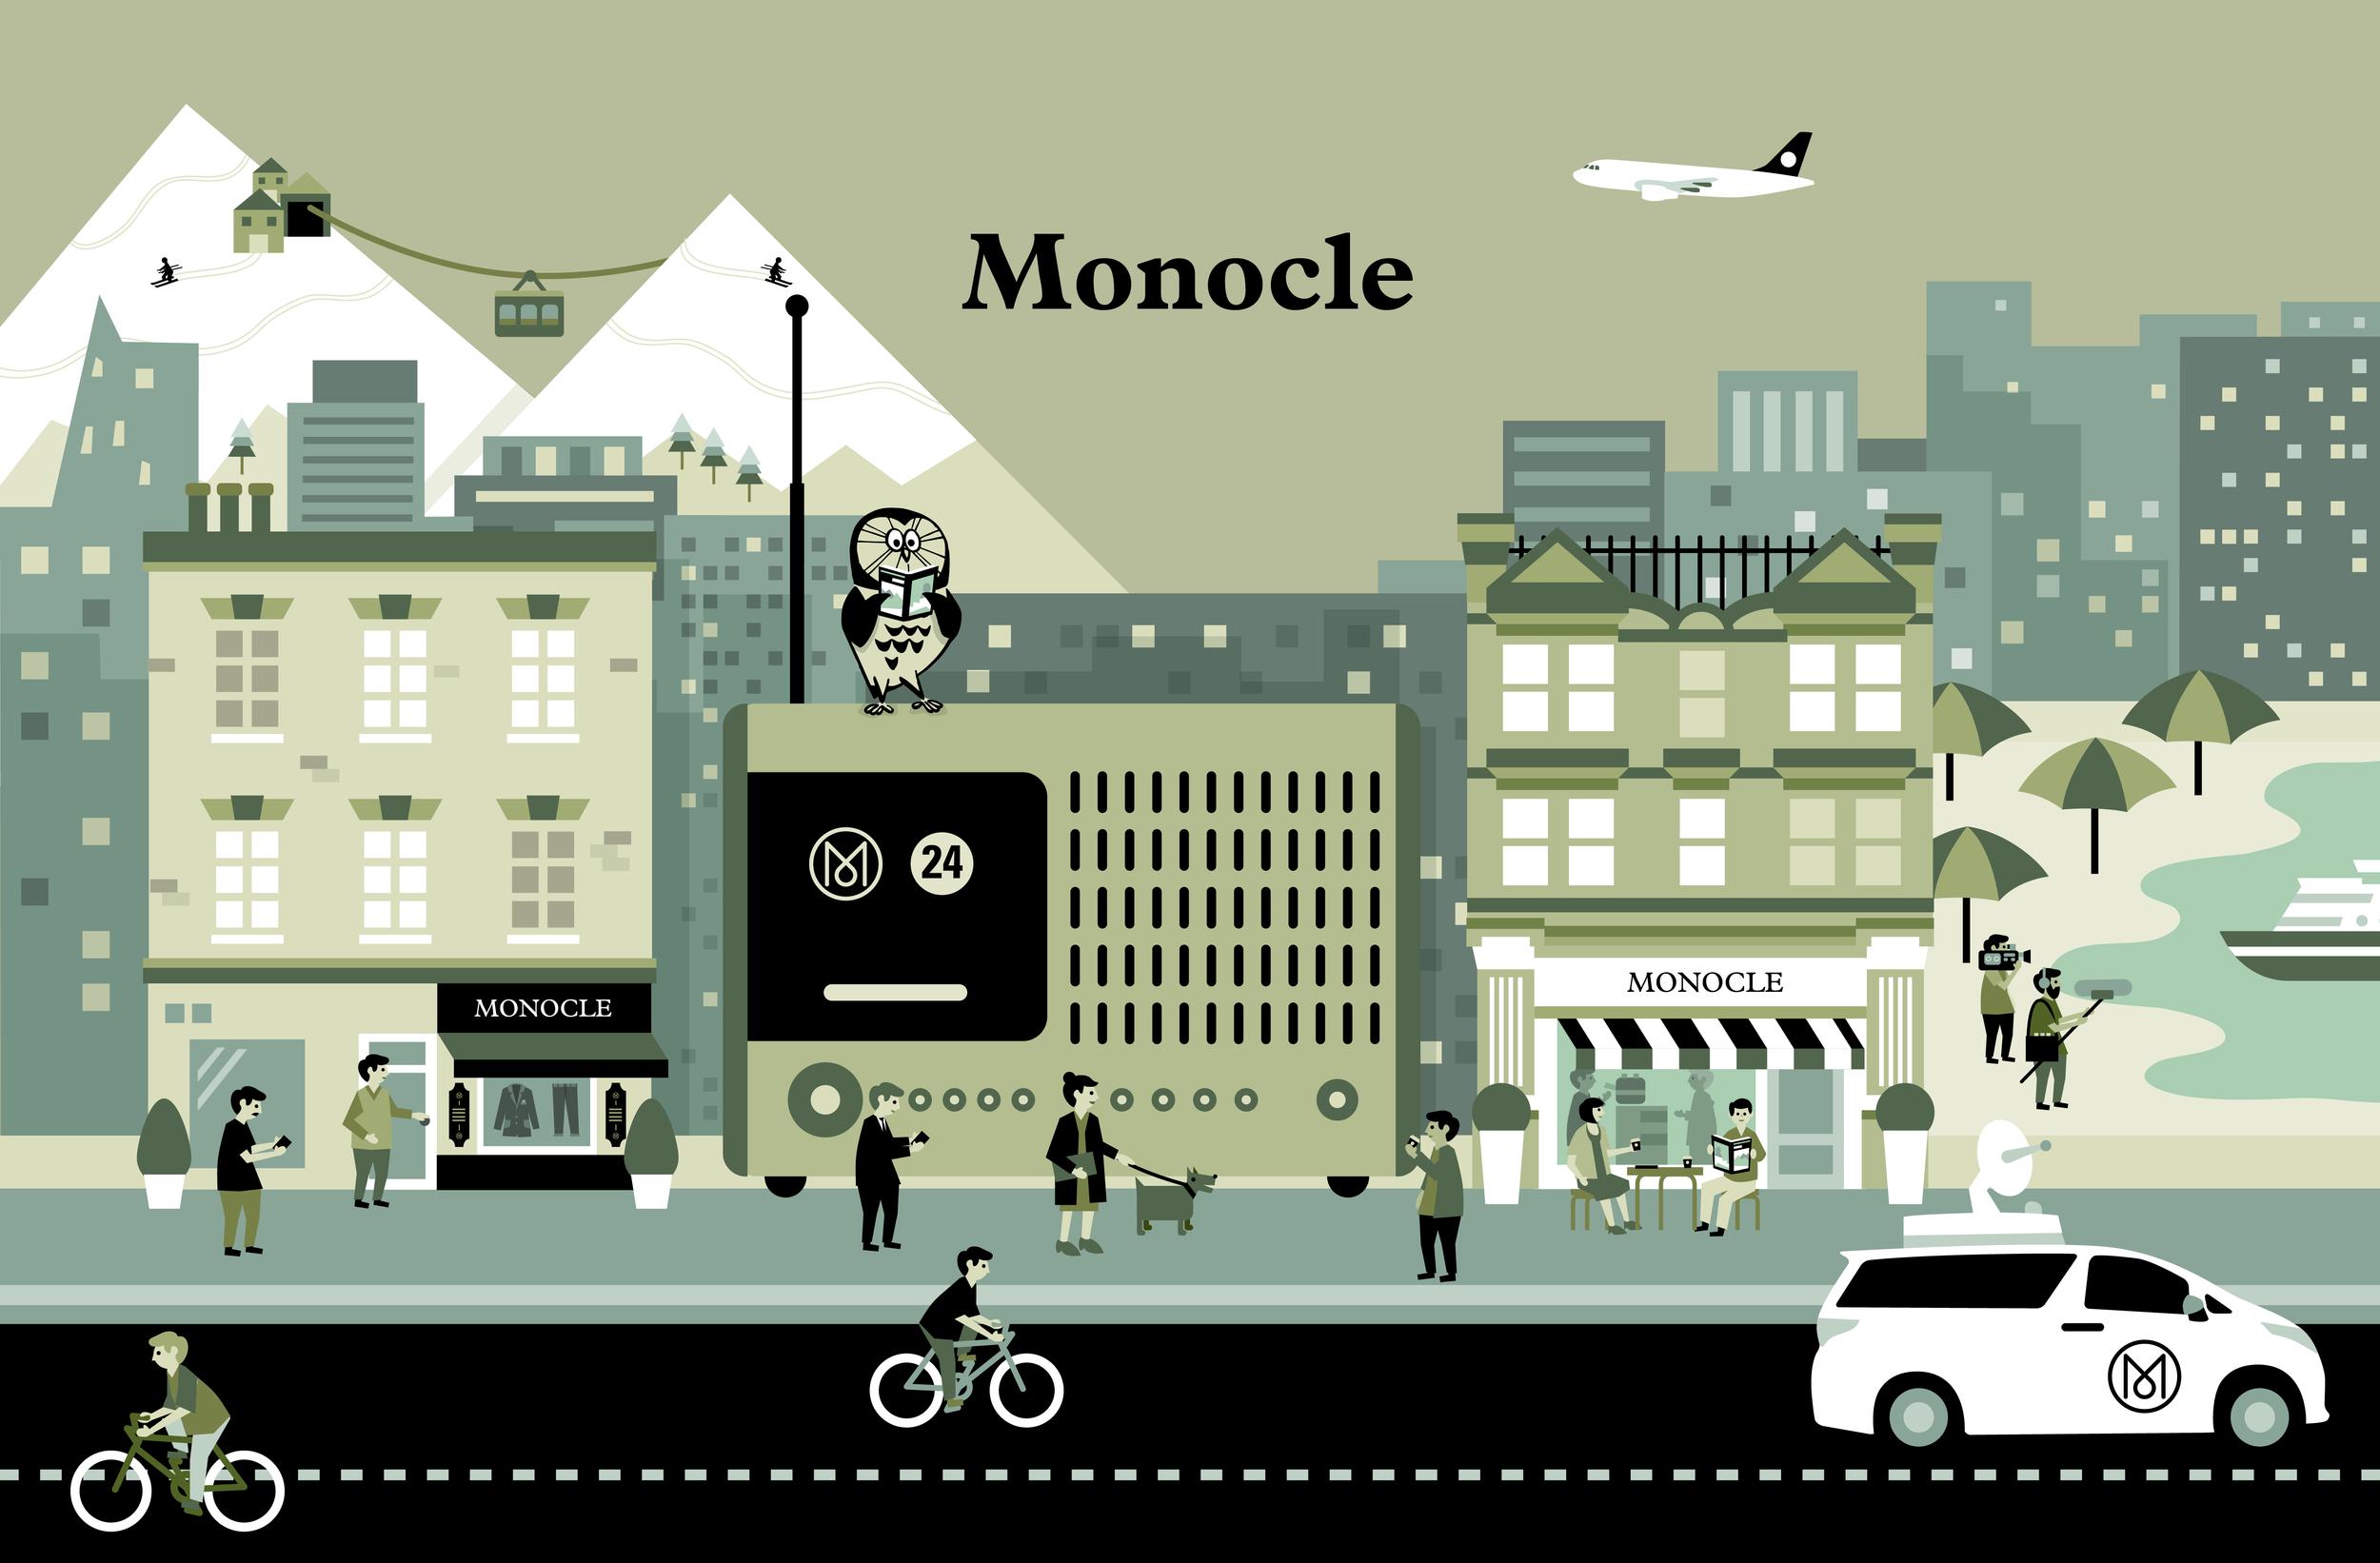 Monocle_Final_v3-01.png